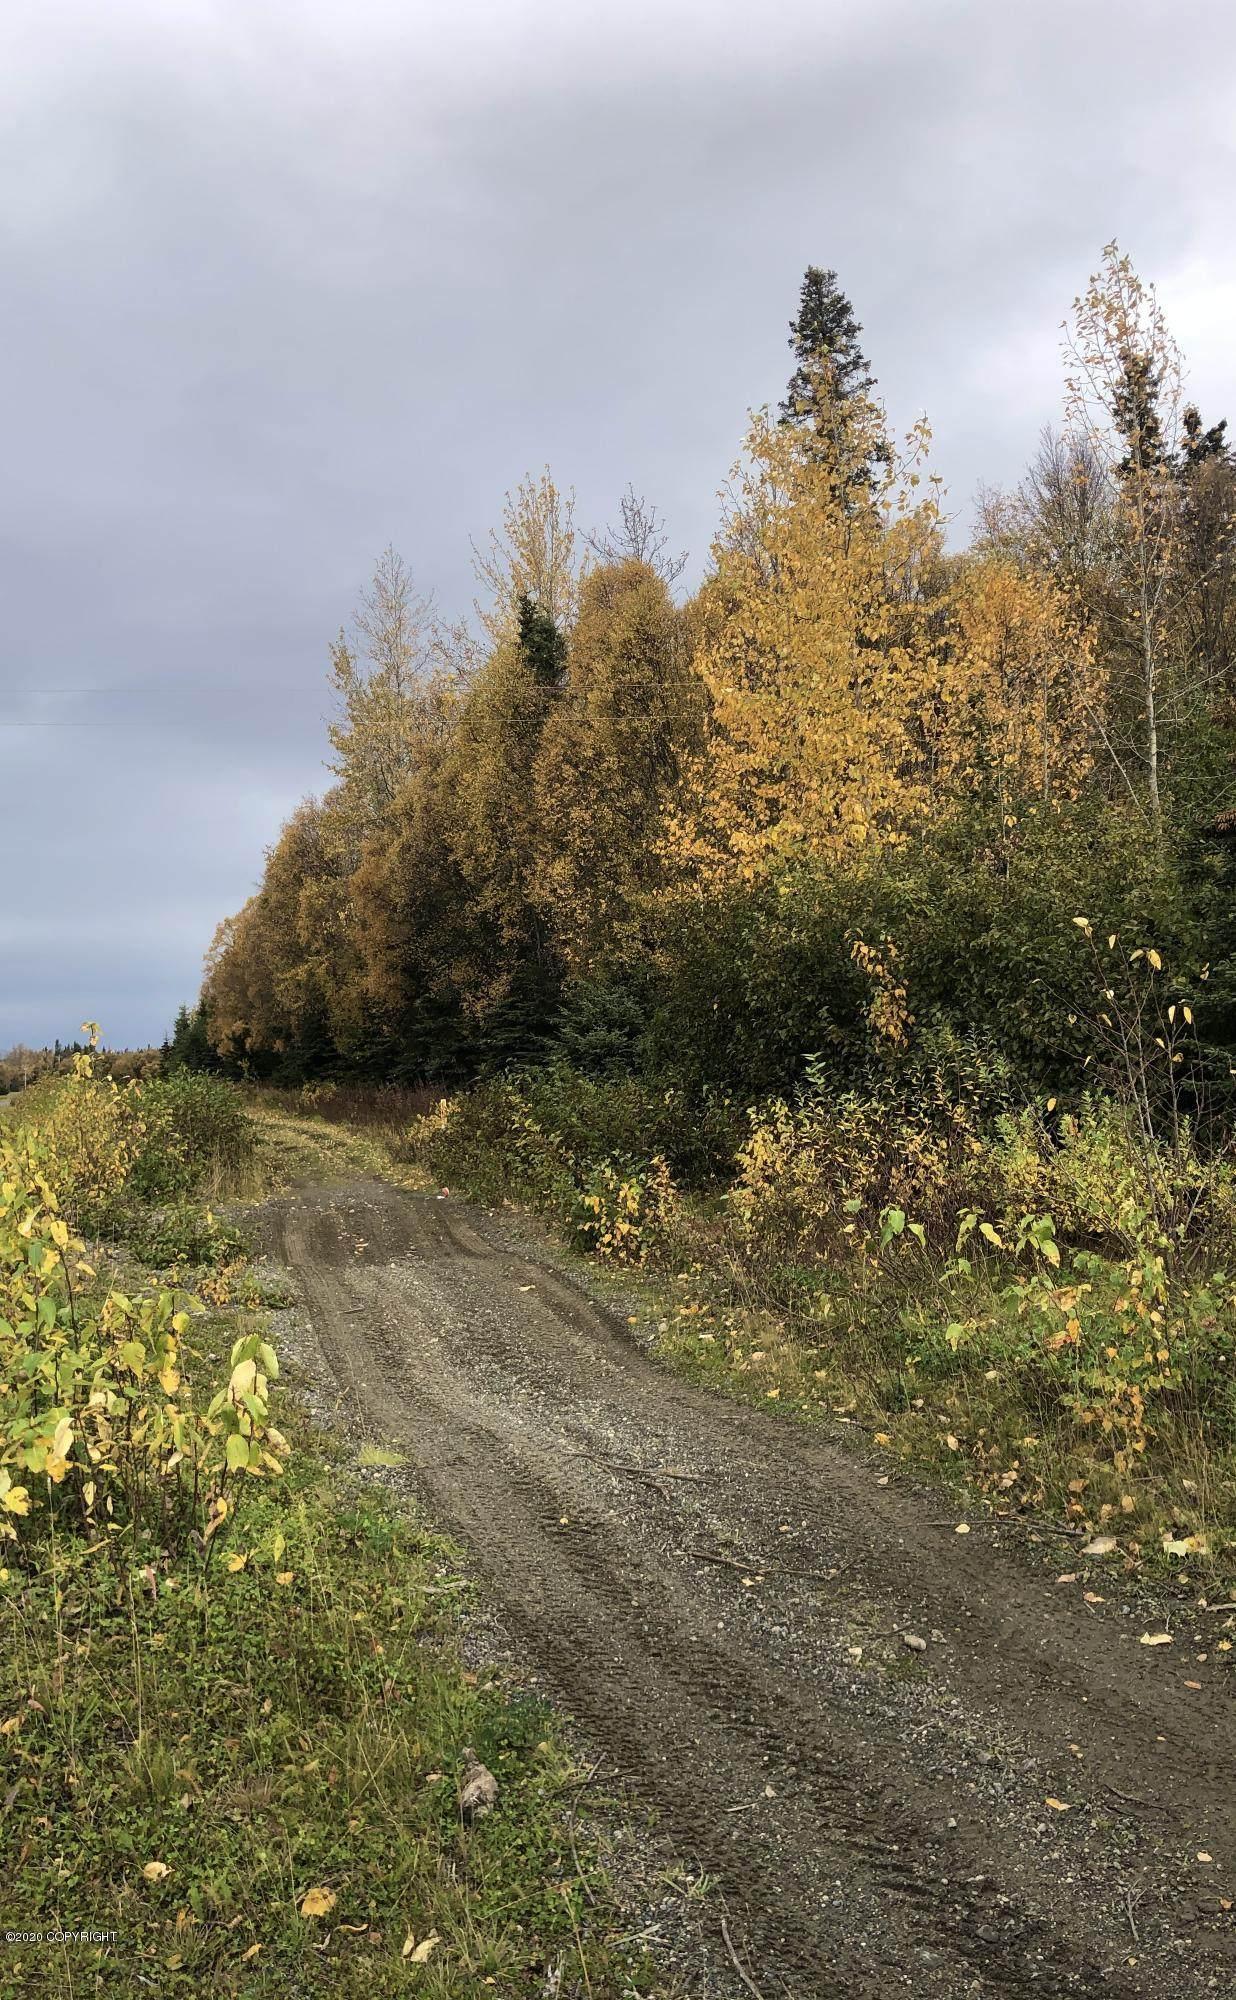 https://bt-photos.global.ssl.fastly.net/alaska/orig_boomver_1_20-15442-2.jpg